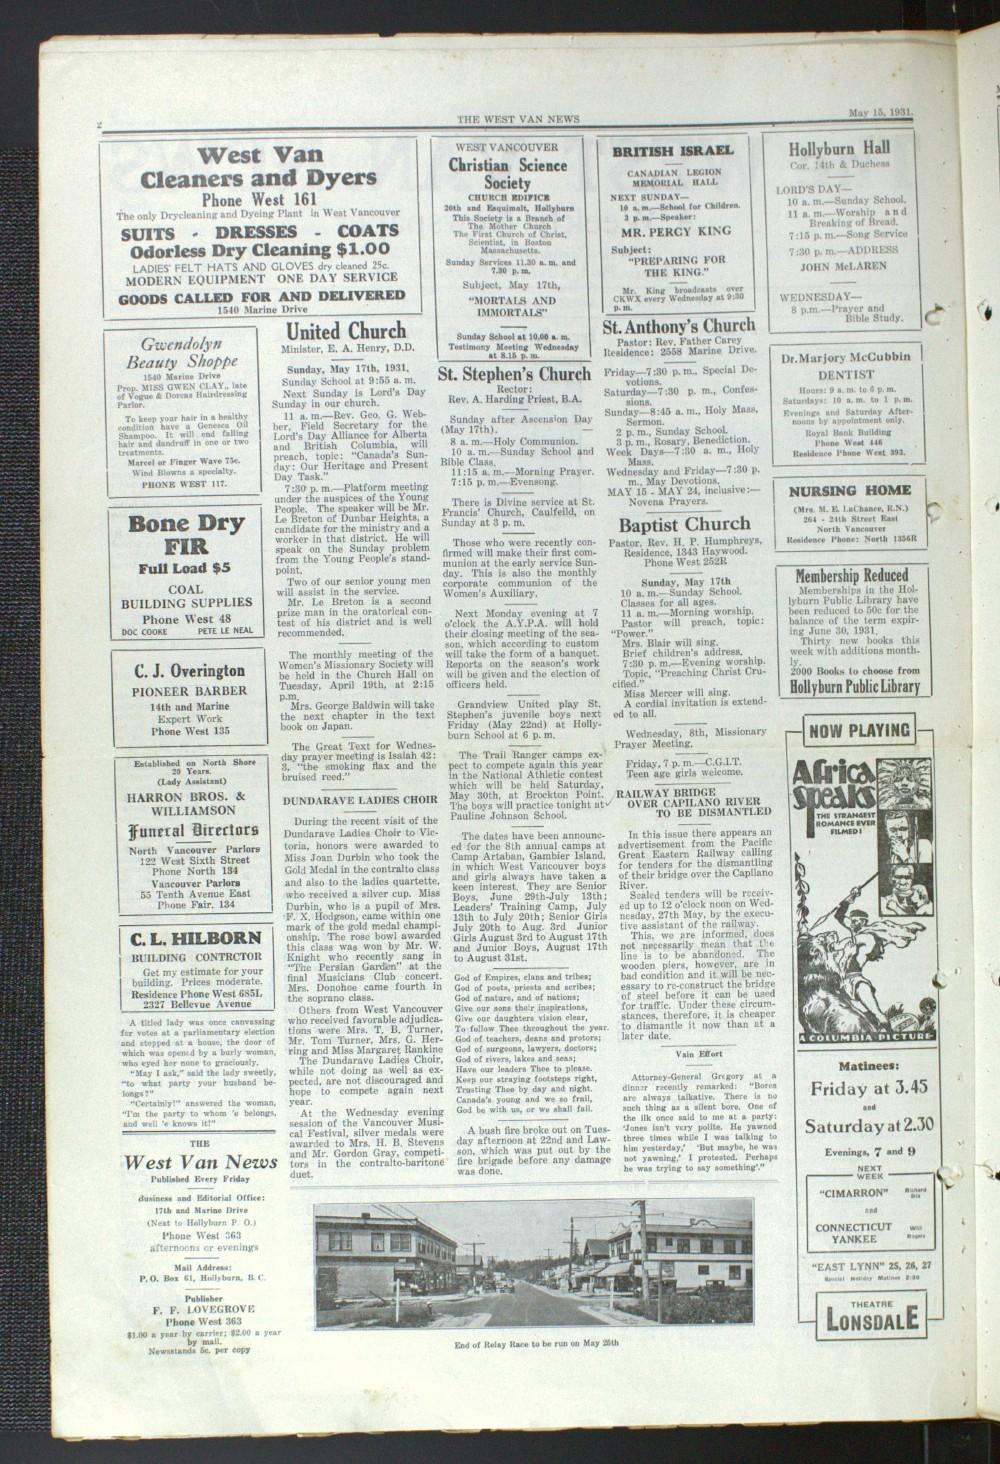 West Van. News (West Vancouver), 15 May 1931